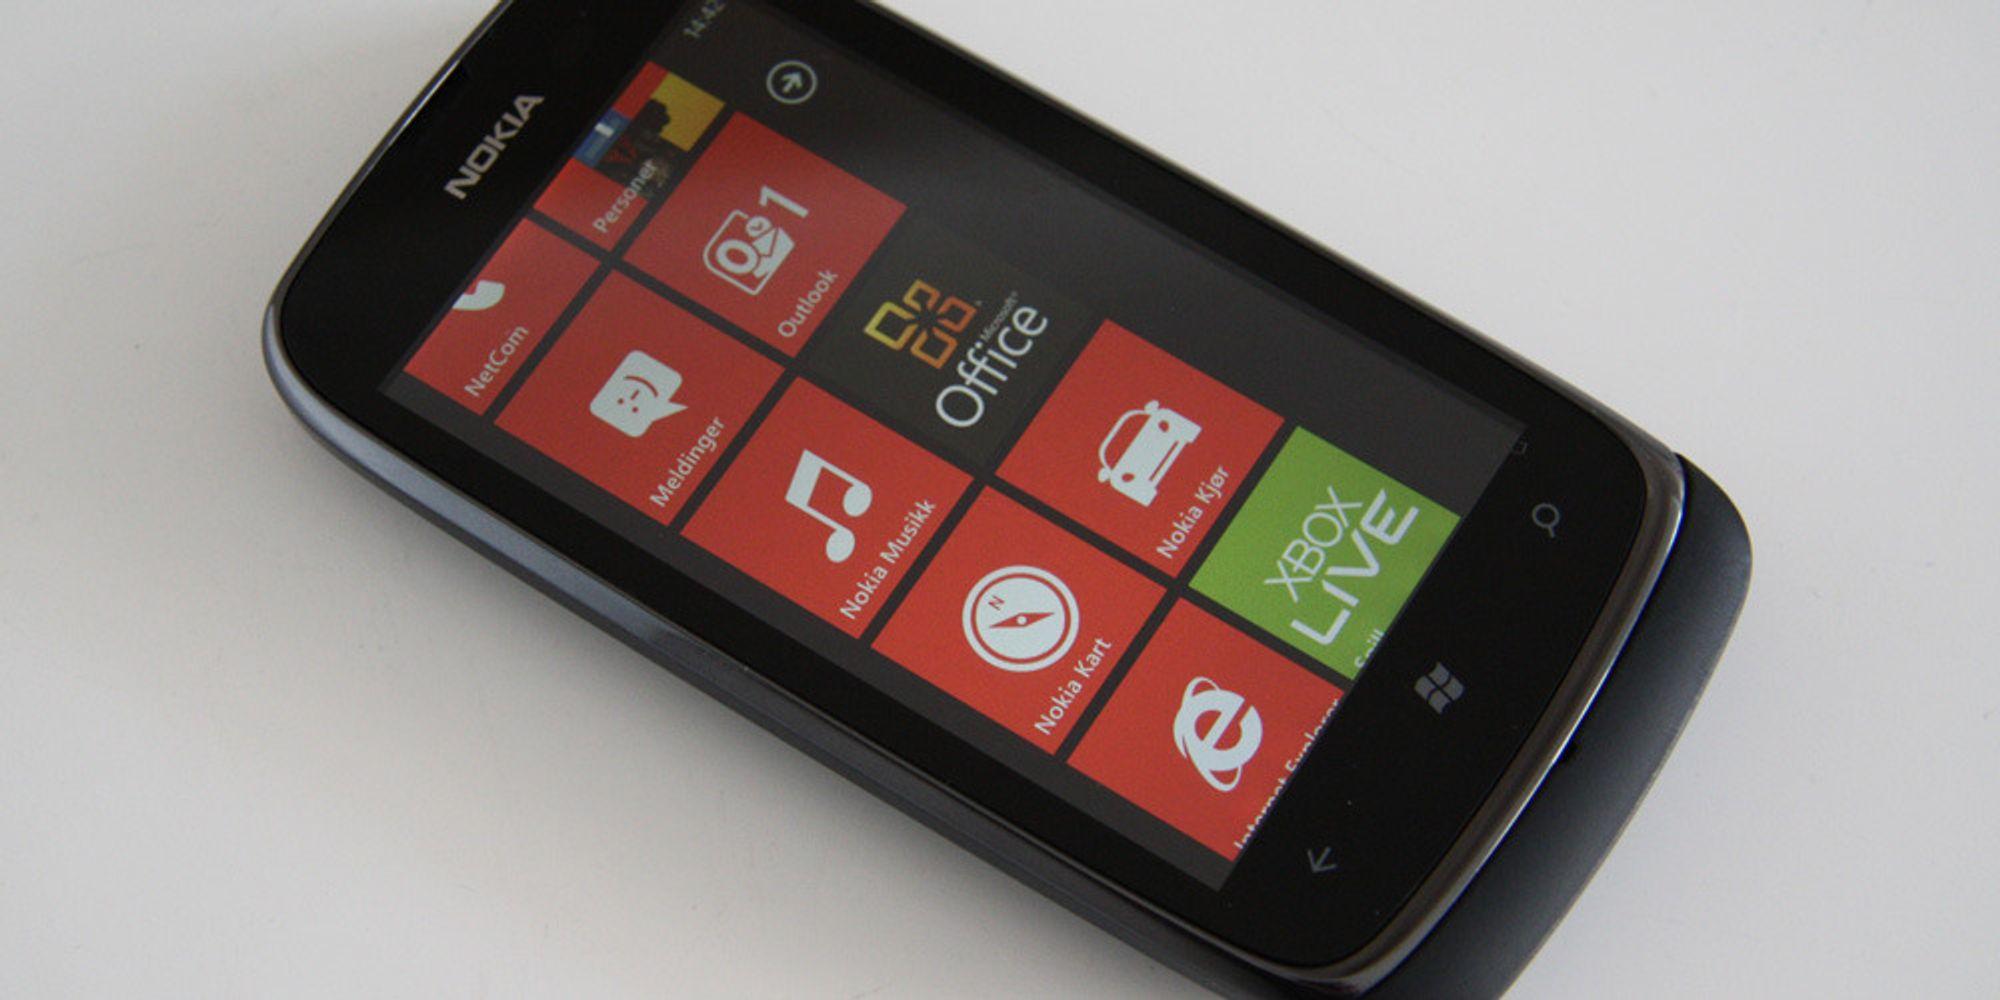 Nokia lover rimeligere Lumia-telefoner